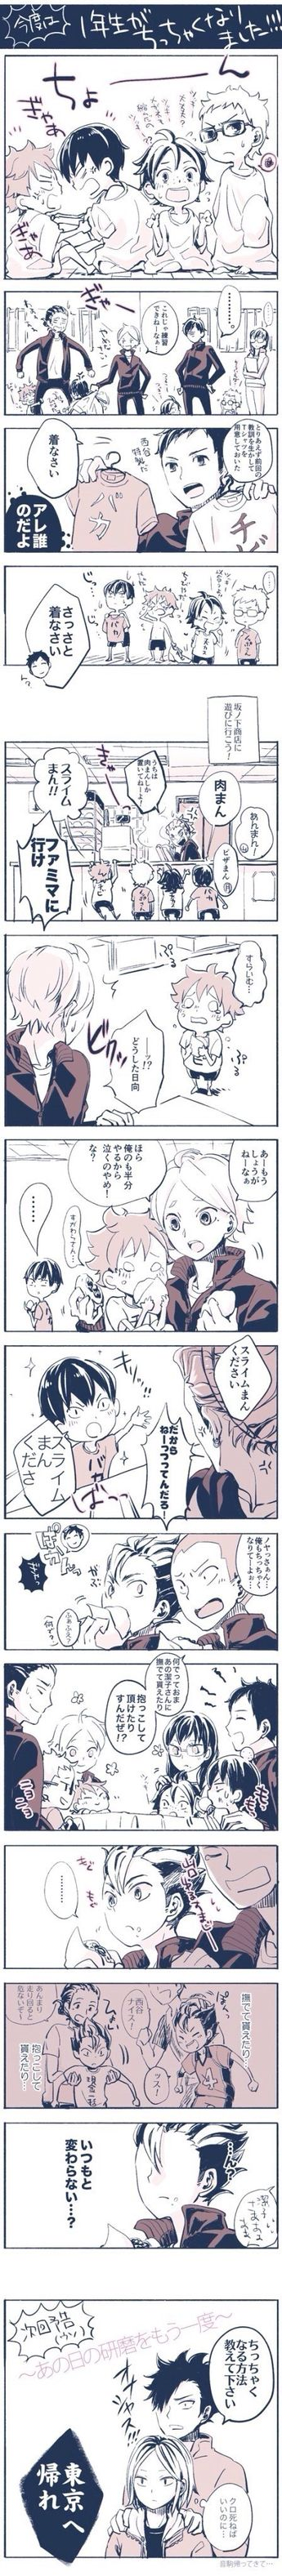 Best Ever Pixiv ハイキュー 小説 10000 Toyamegatsu